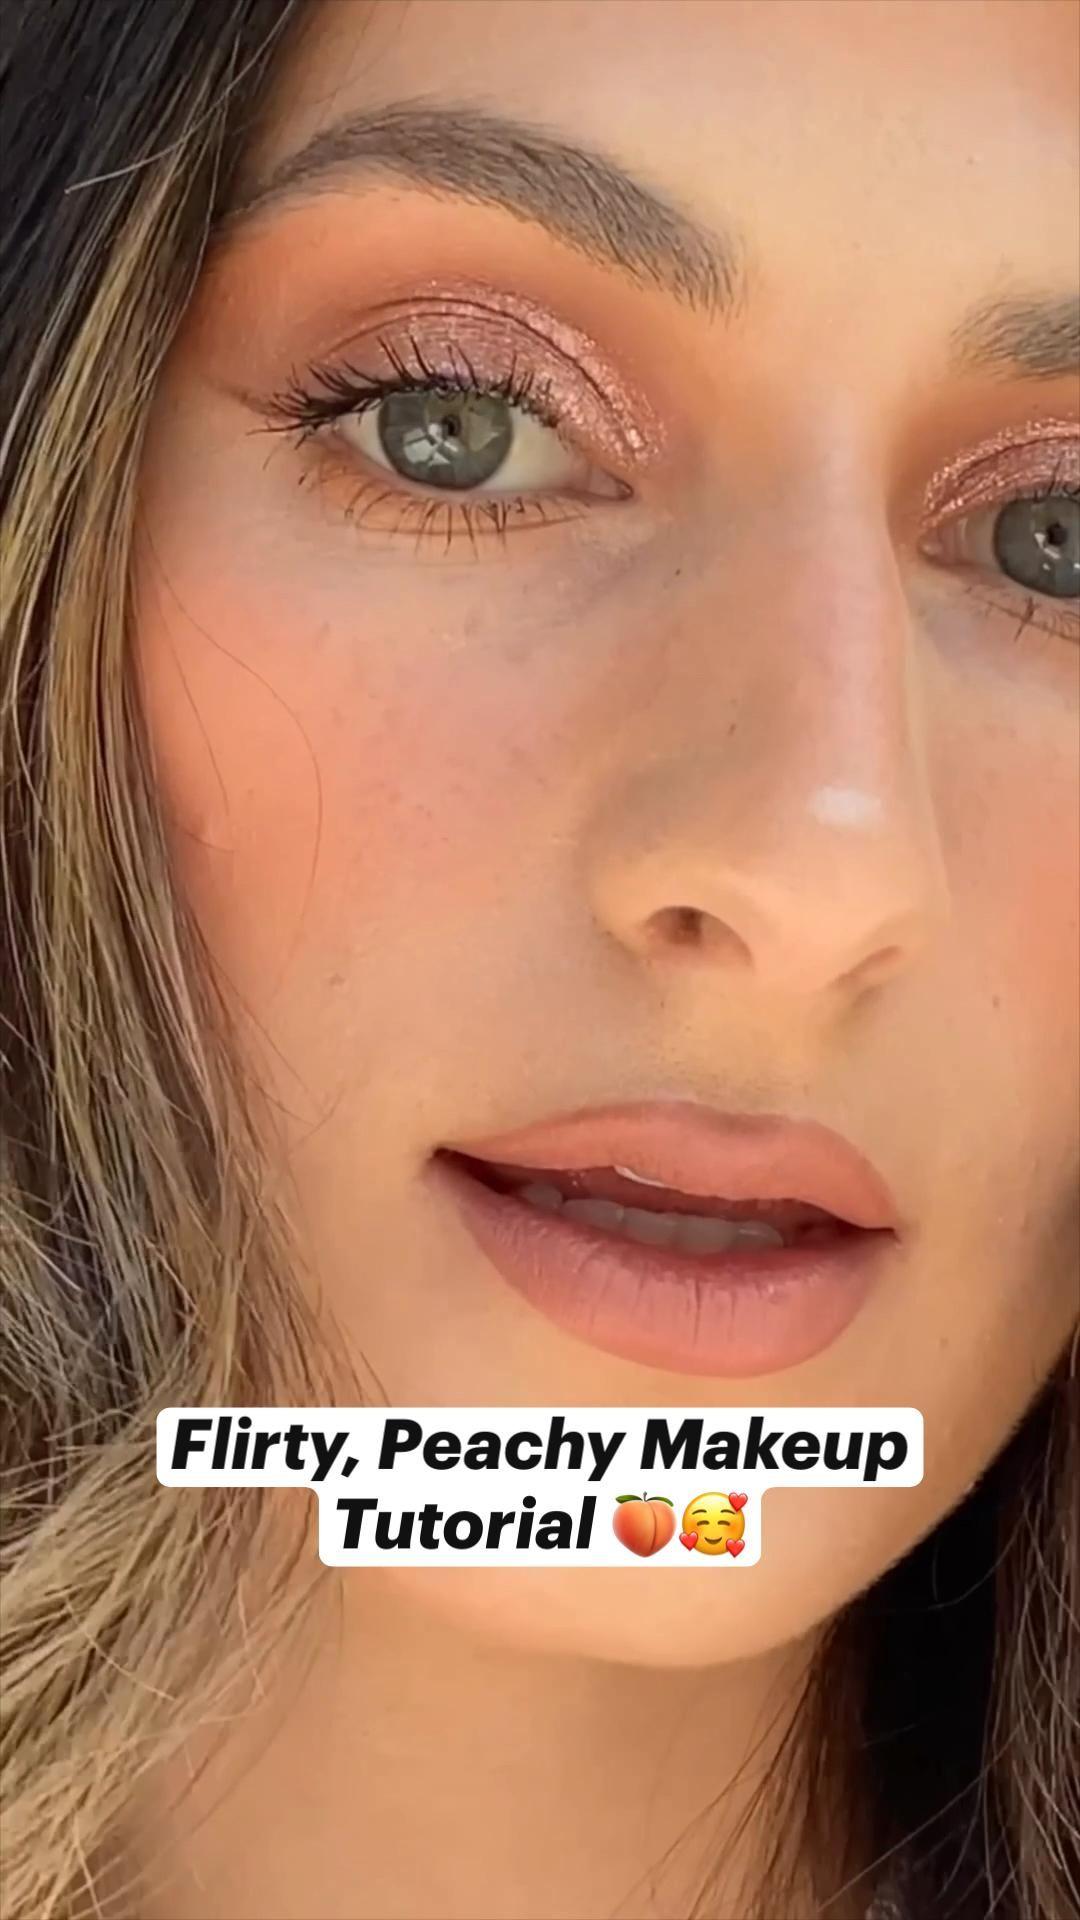 Flirty, Peachy Makeup Tutorial 🍑🥰